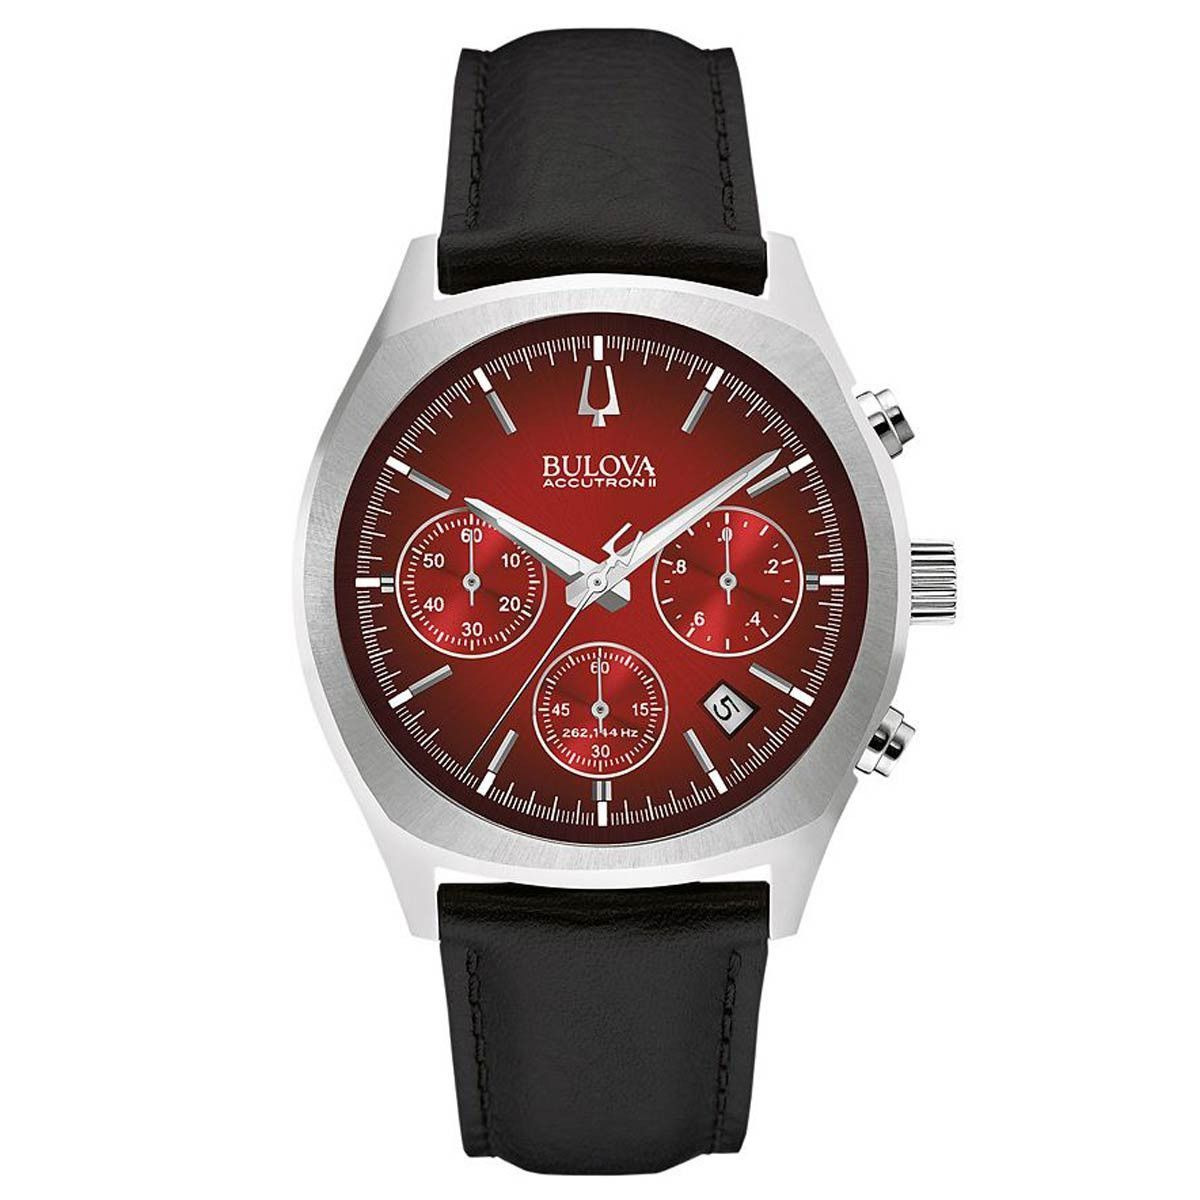 bulova 96b238 menu0027s accutron ii red dial black leather strap chronograph watch